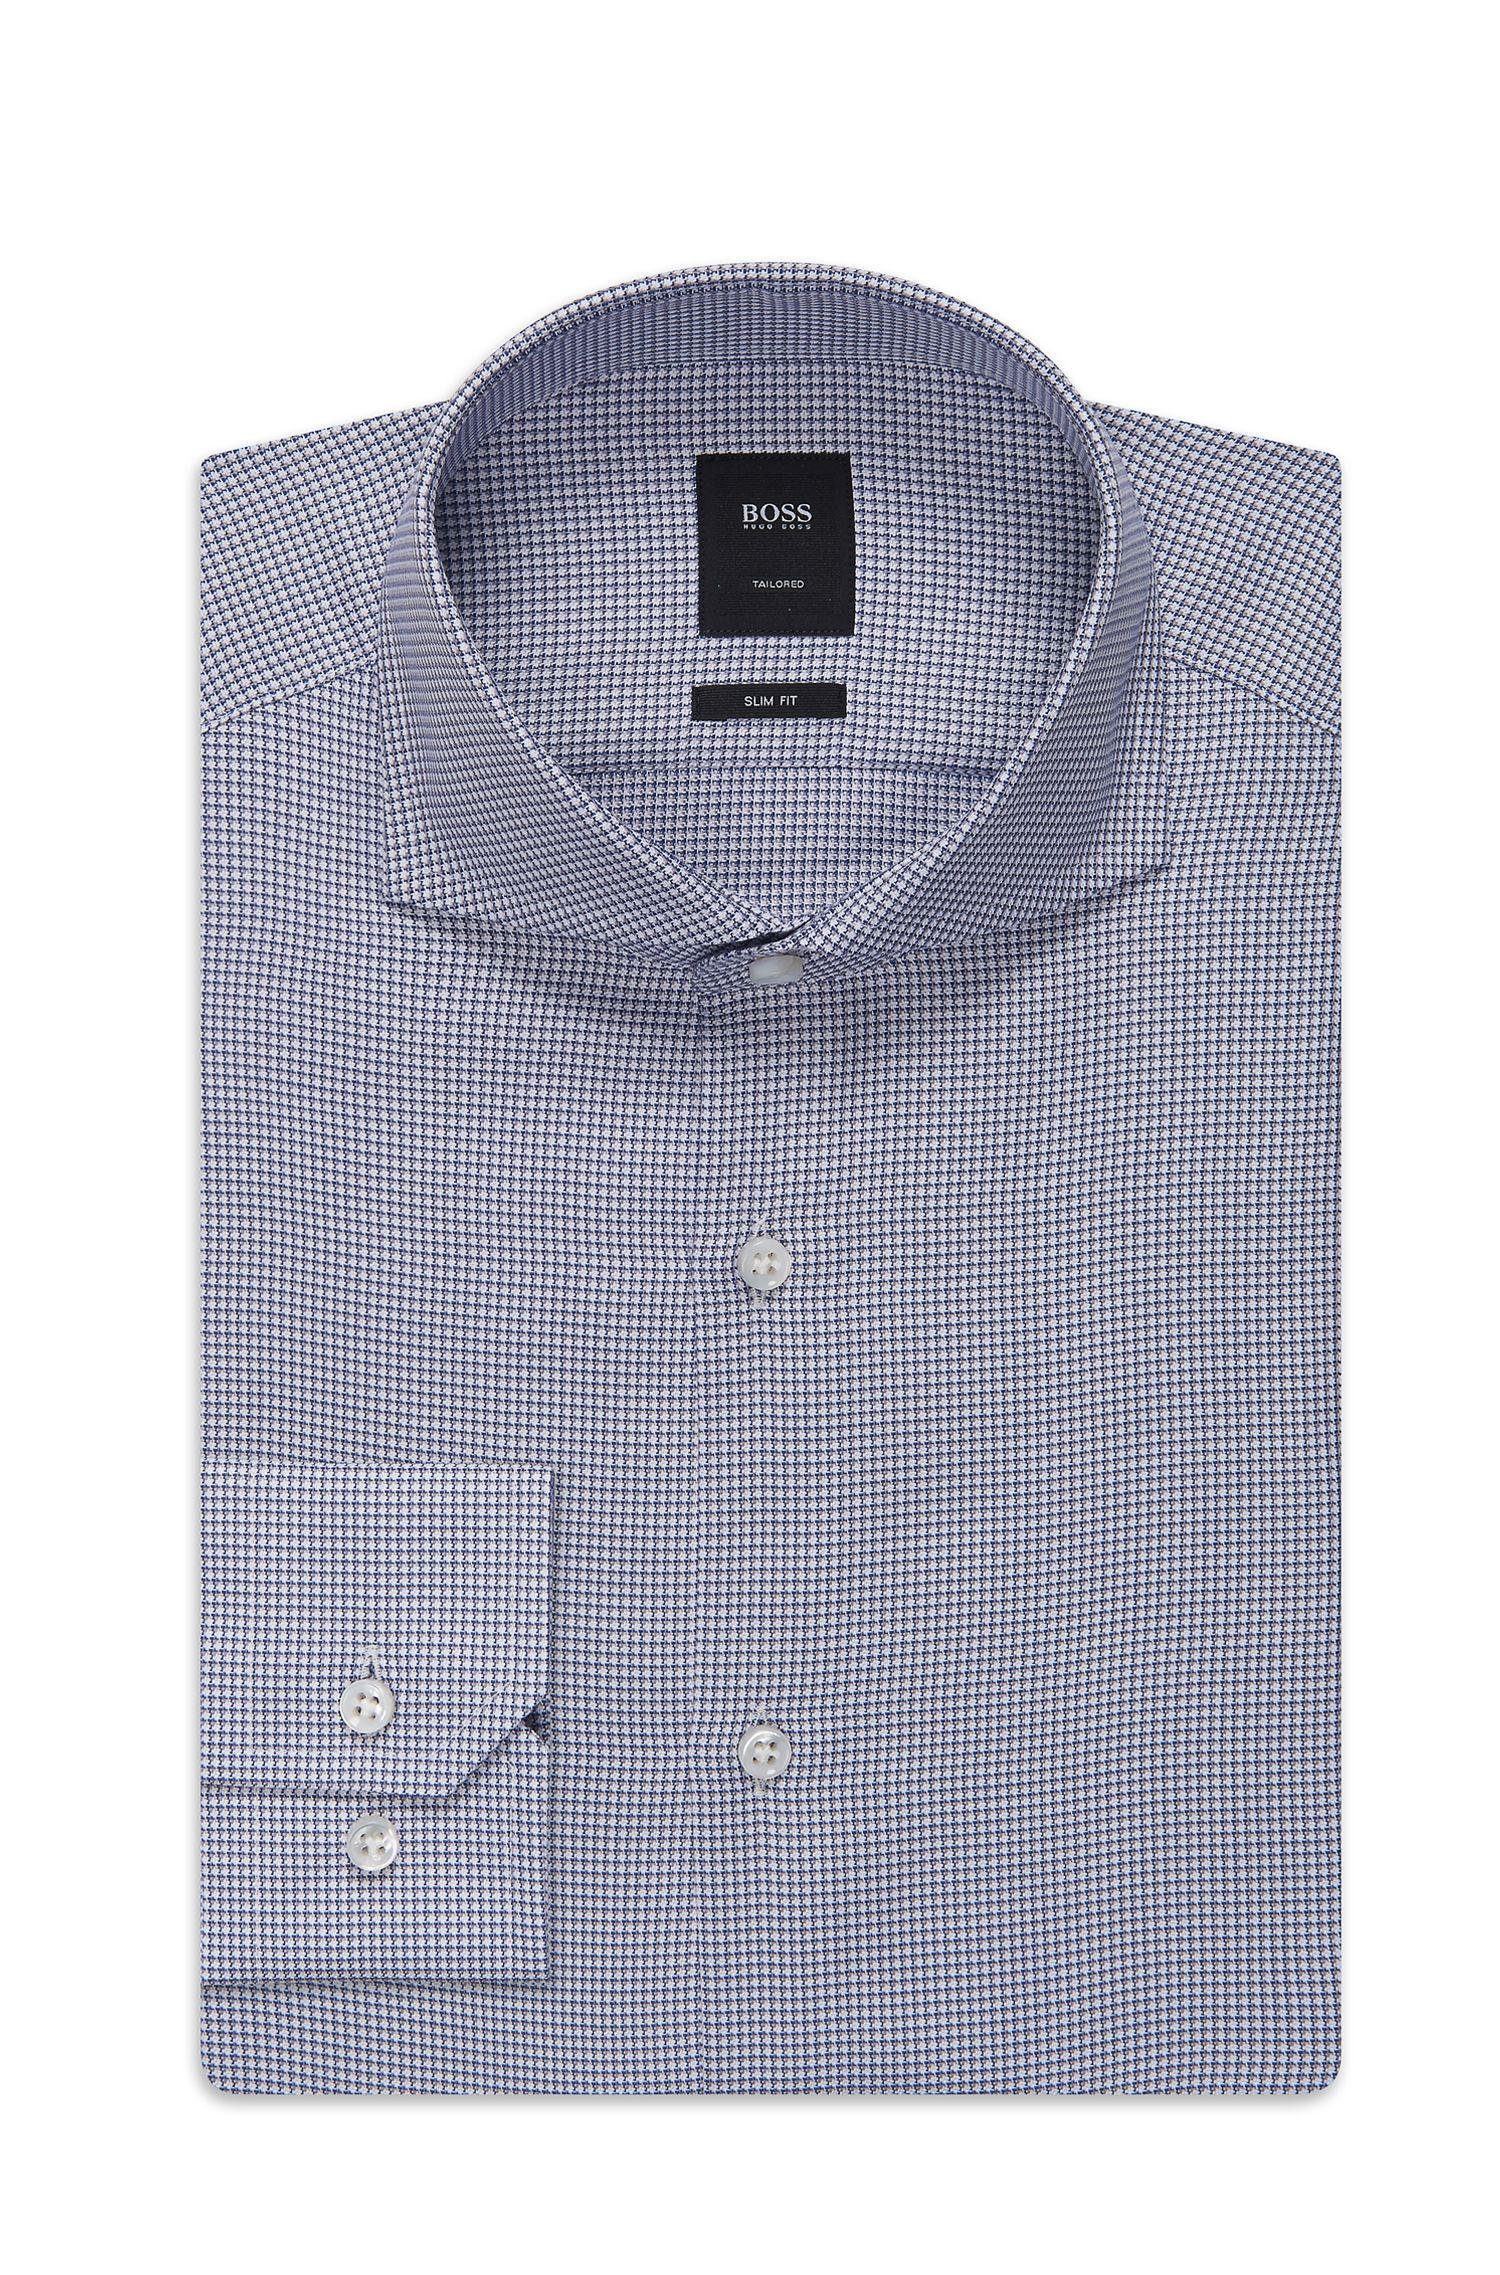 'T-Christo' | Slim Fit, Italian Cotton Dress Shirt